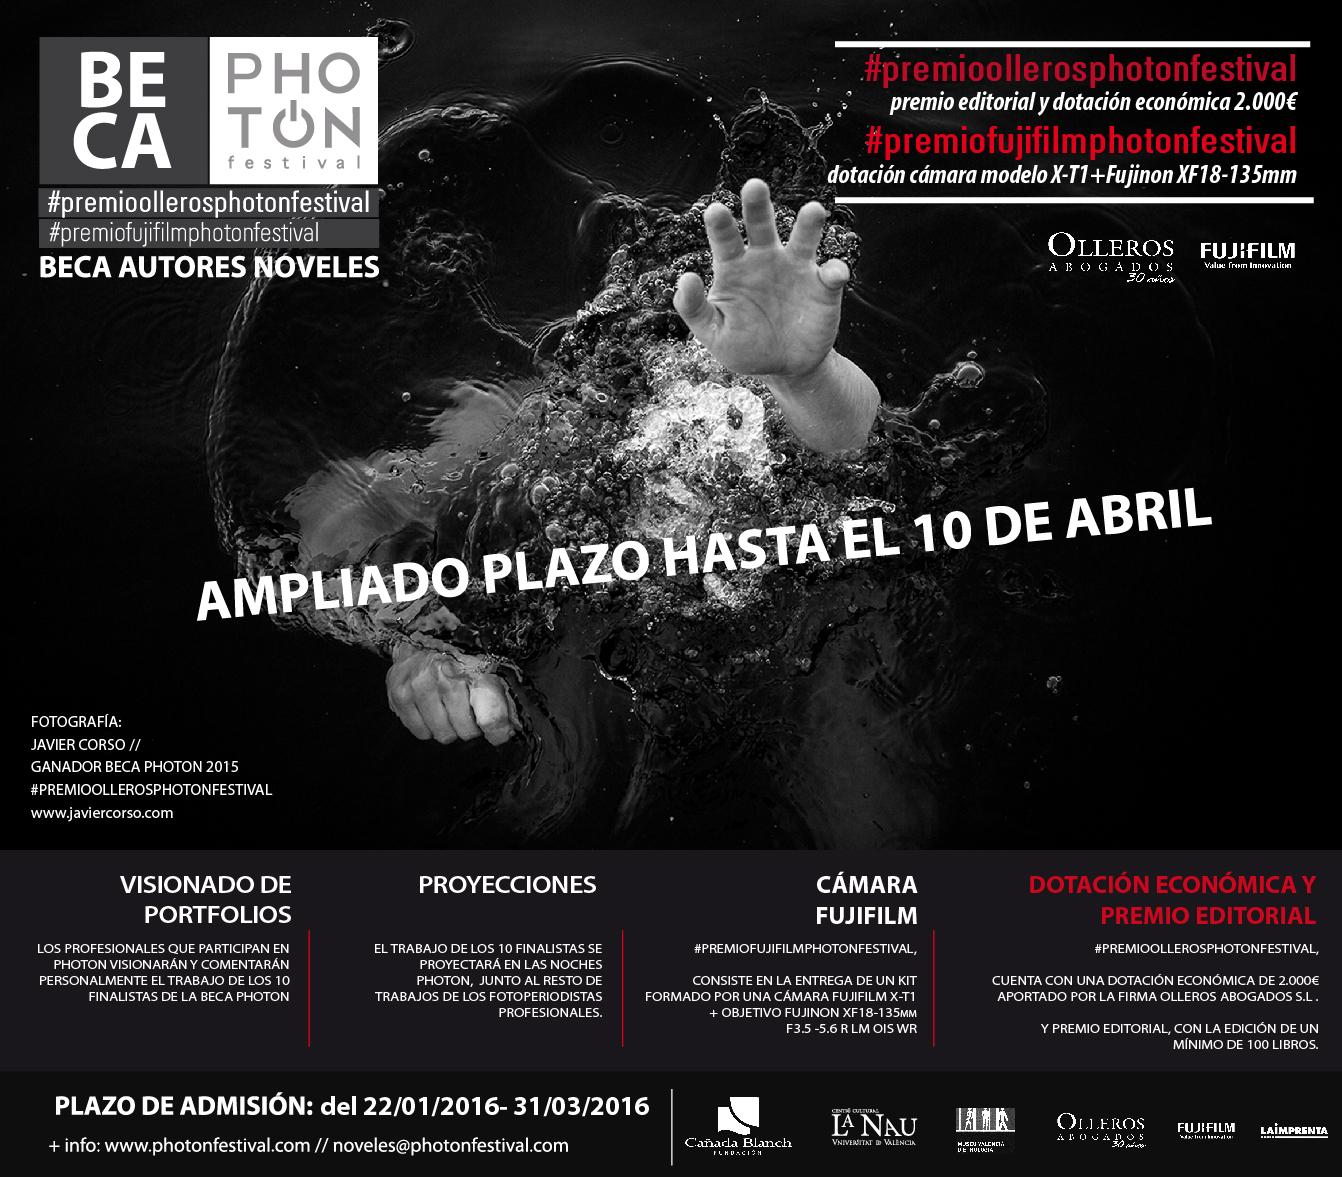 CARTEL_BECA PHOTON FESTIVAL 2016-ampliado plazo 10 de abril